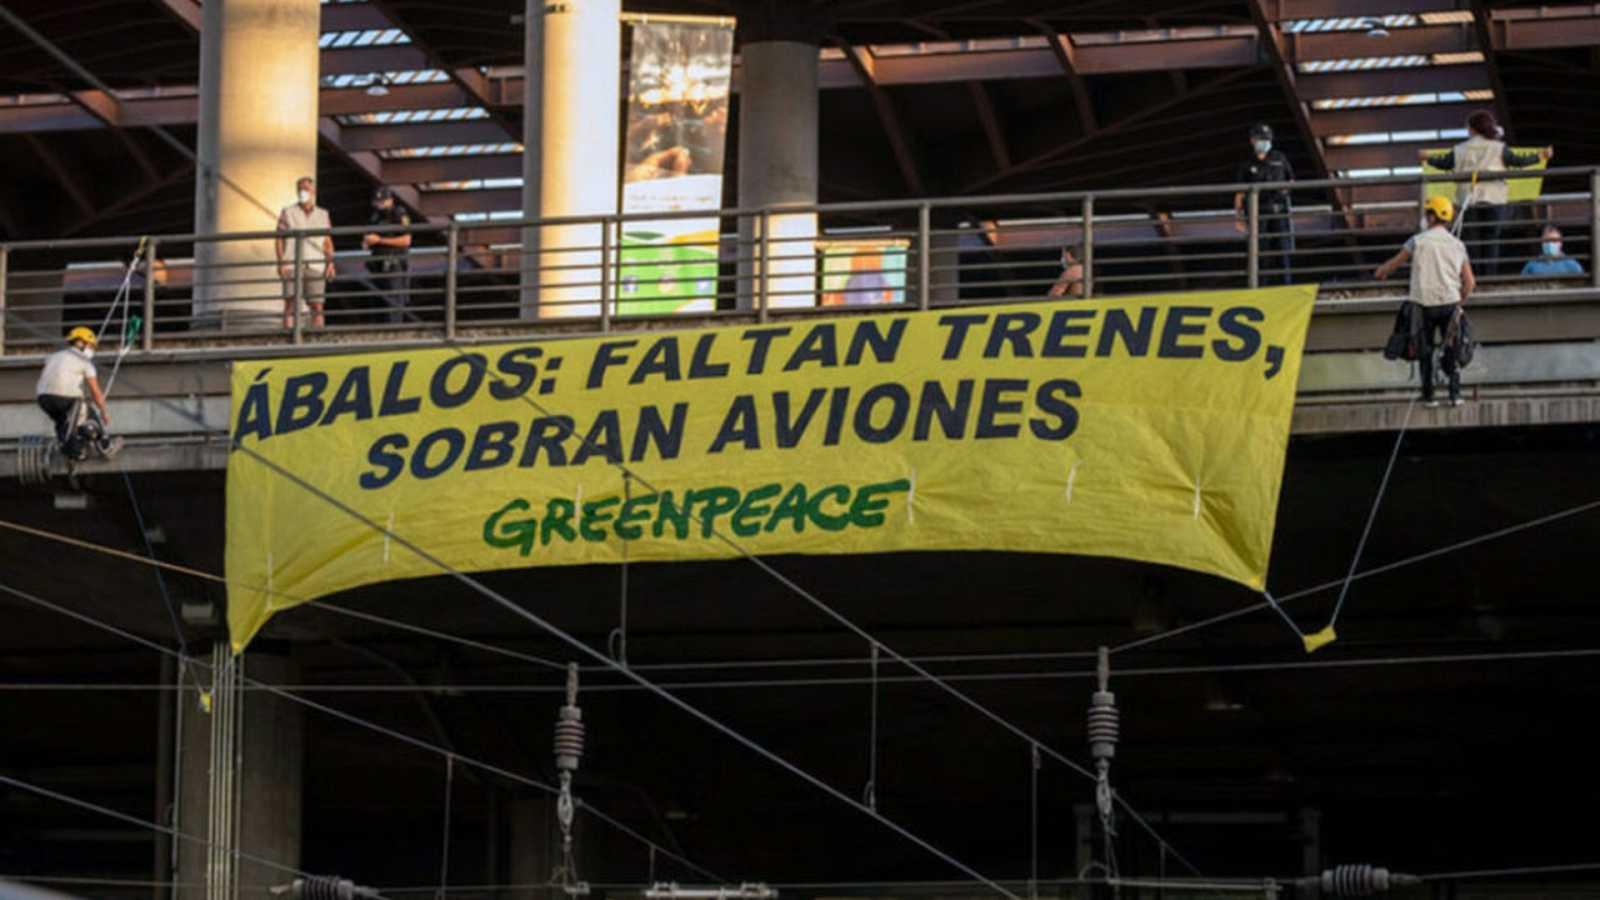 En un mundo feliz - Greenpeace - 05/09/20 - Escuchar ahora